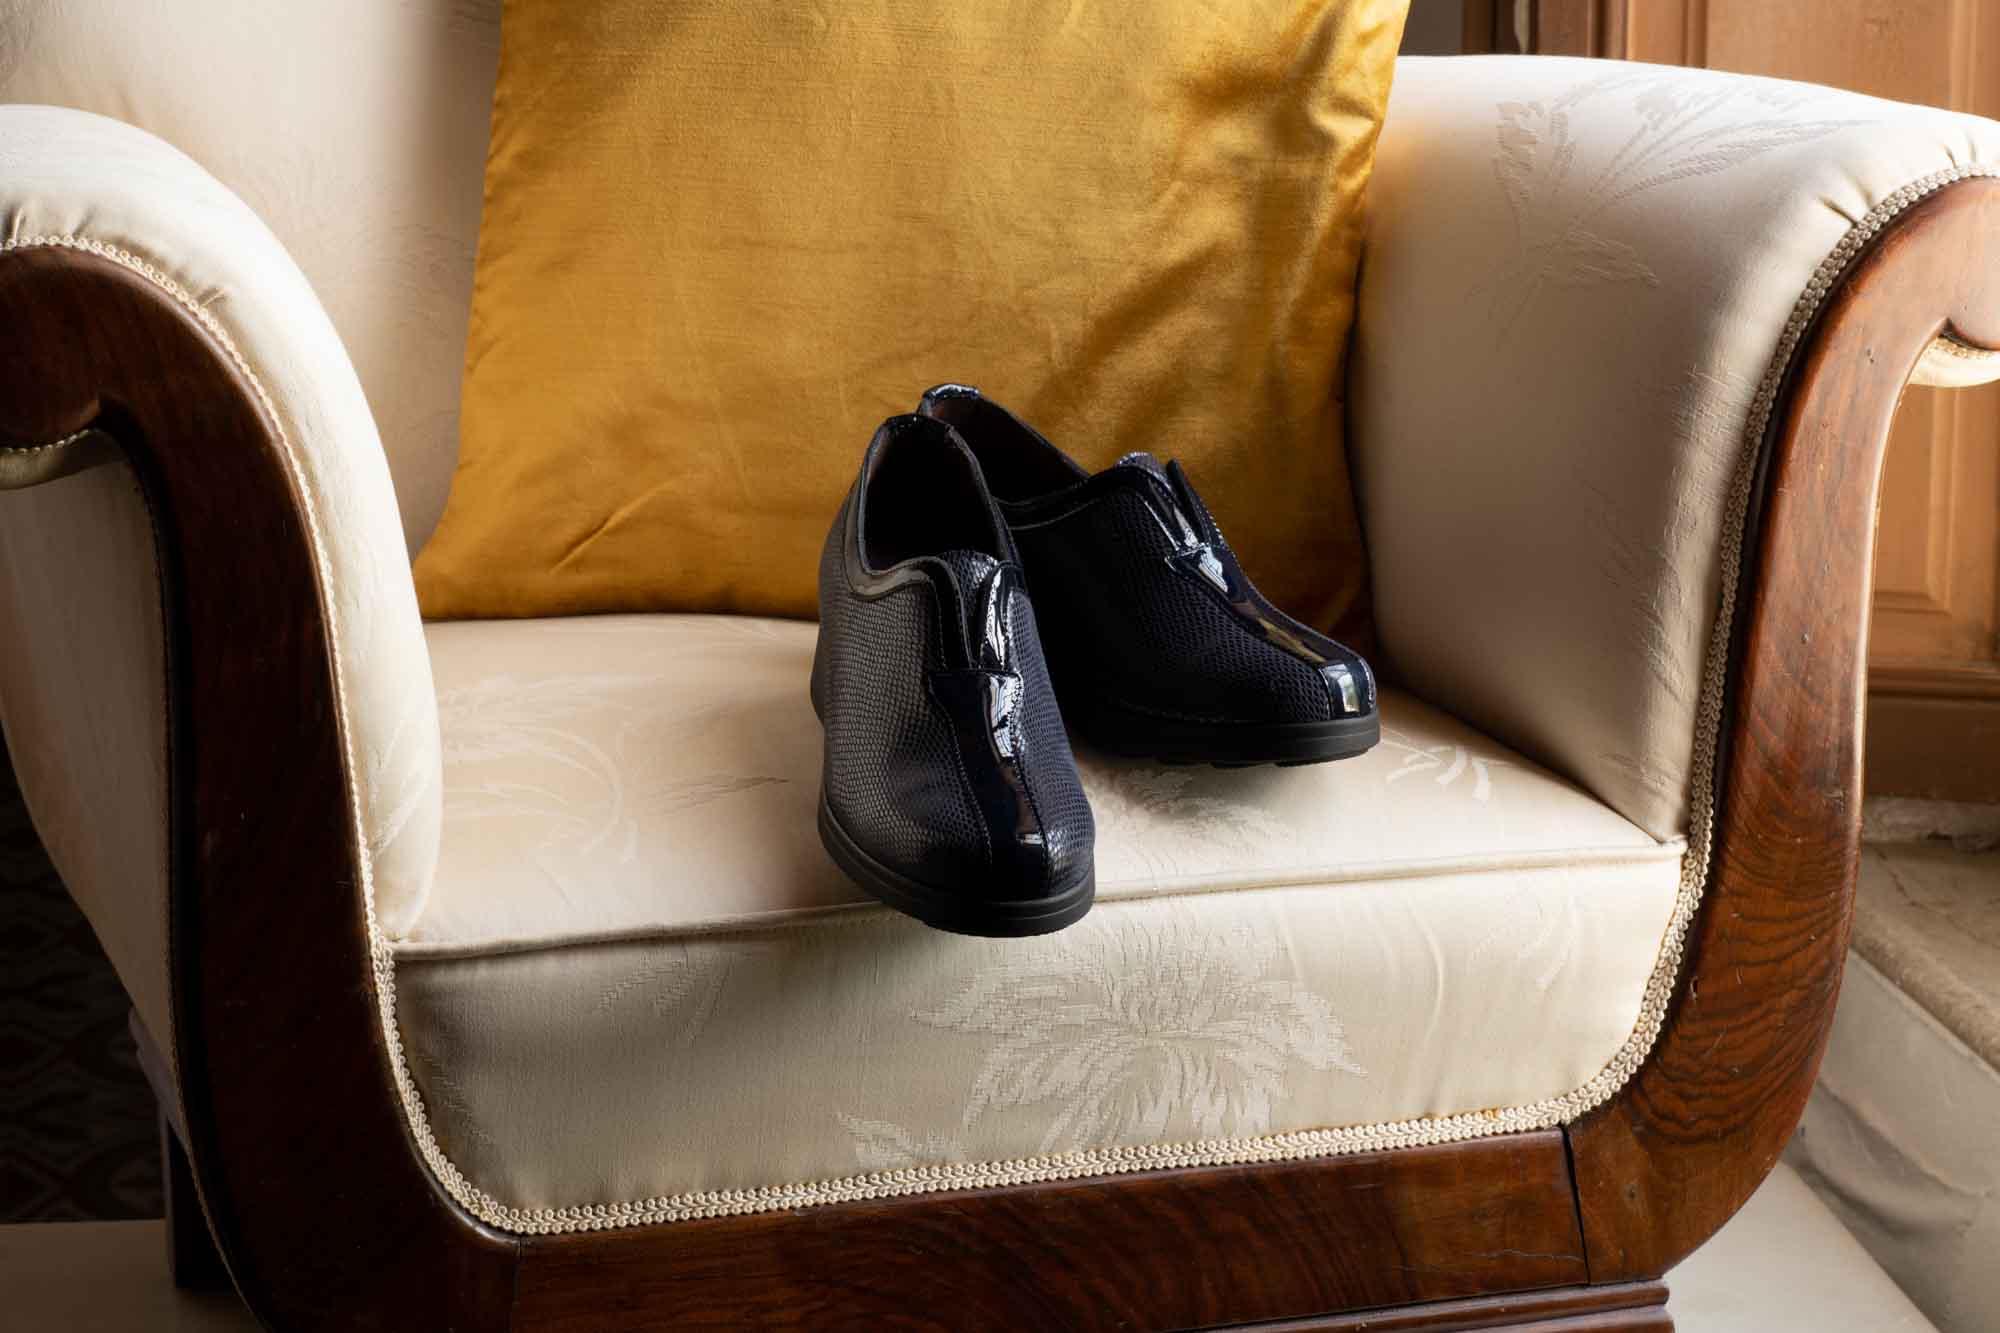 Zapatos azul oscuro en silla antigua de color claro y cojín naranja